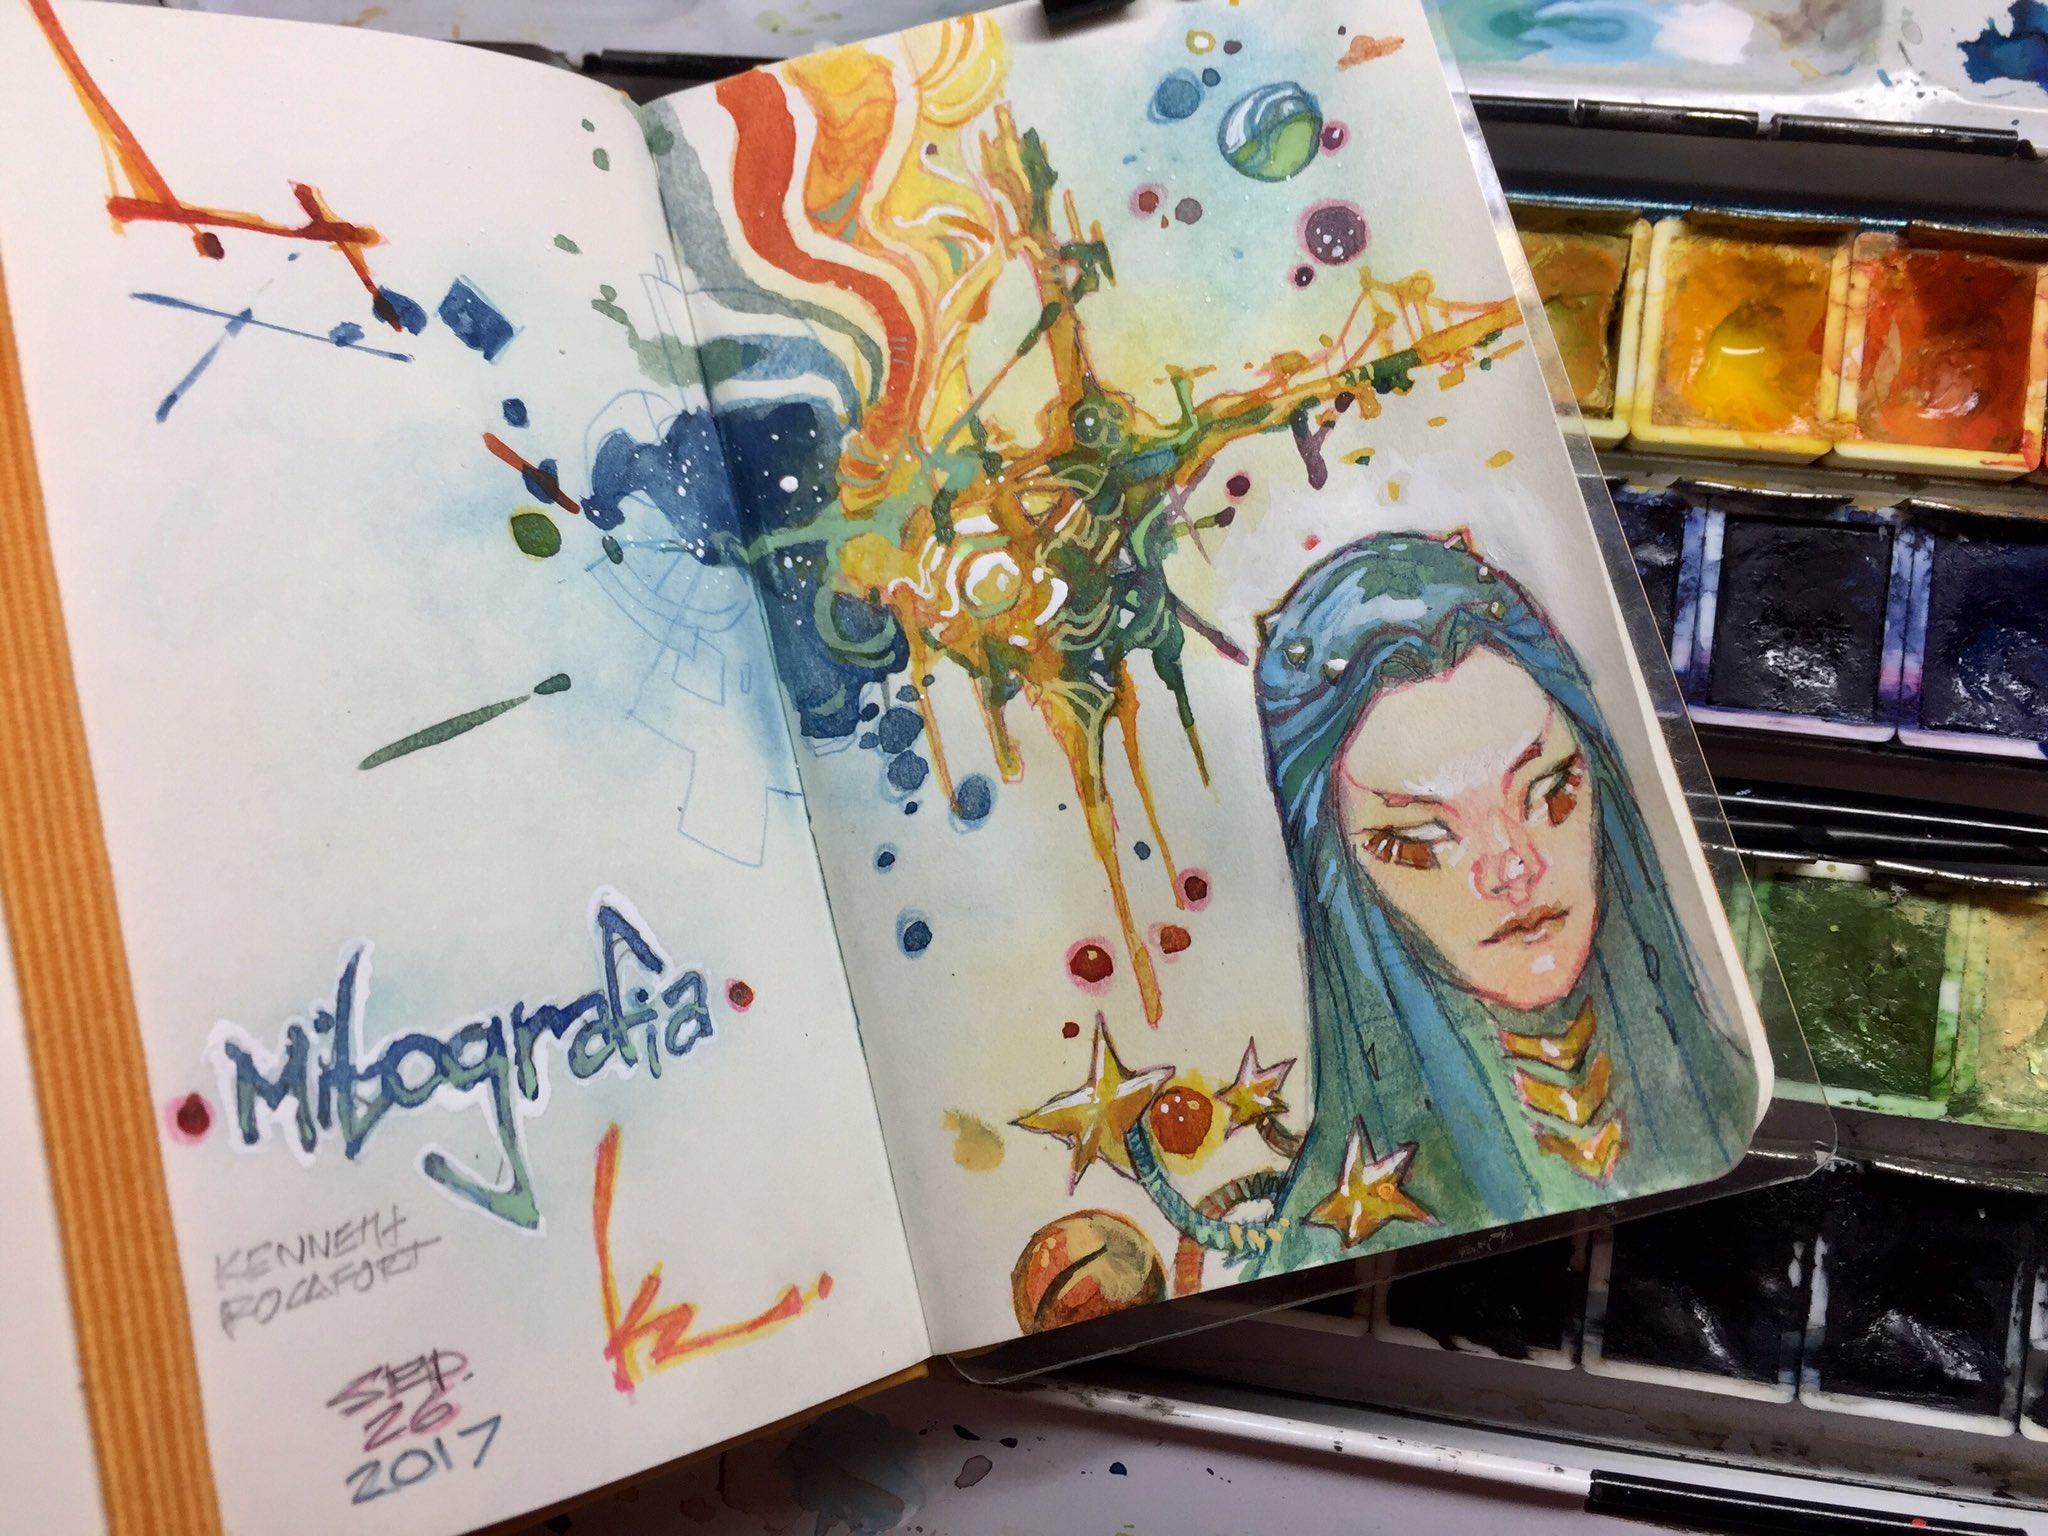 MOLESKINE By Fantomette - cover